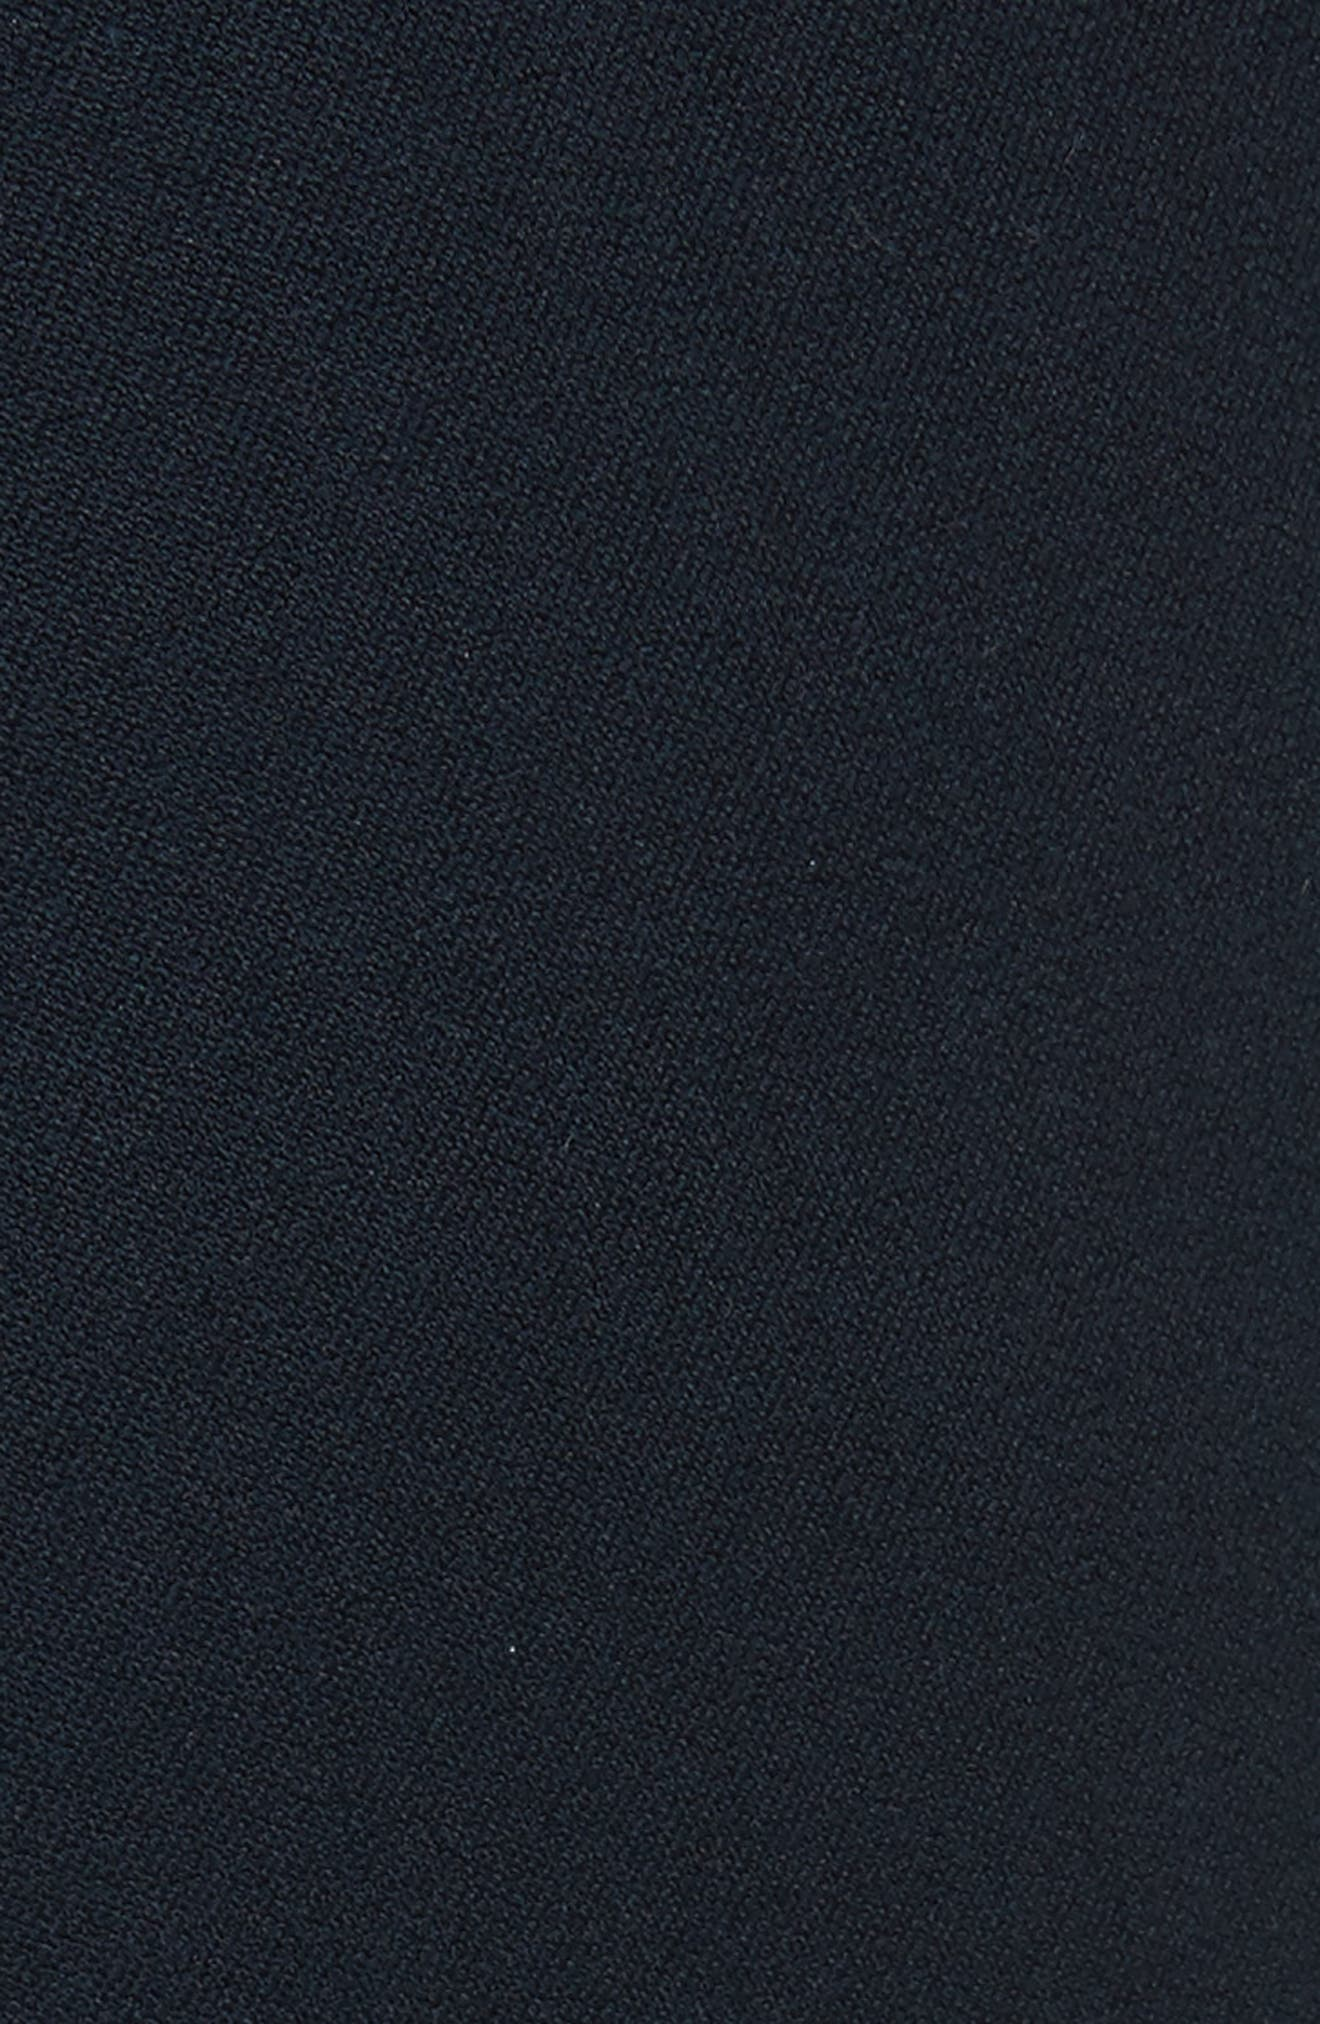 Ellie Jodhpur Pants,                             Alternate thumbnail 5, color,                             Navy